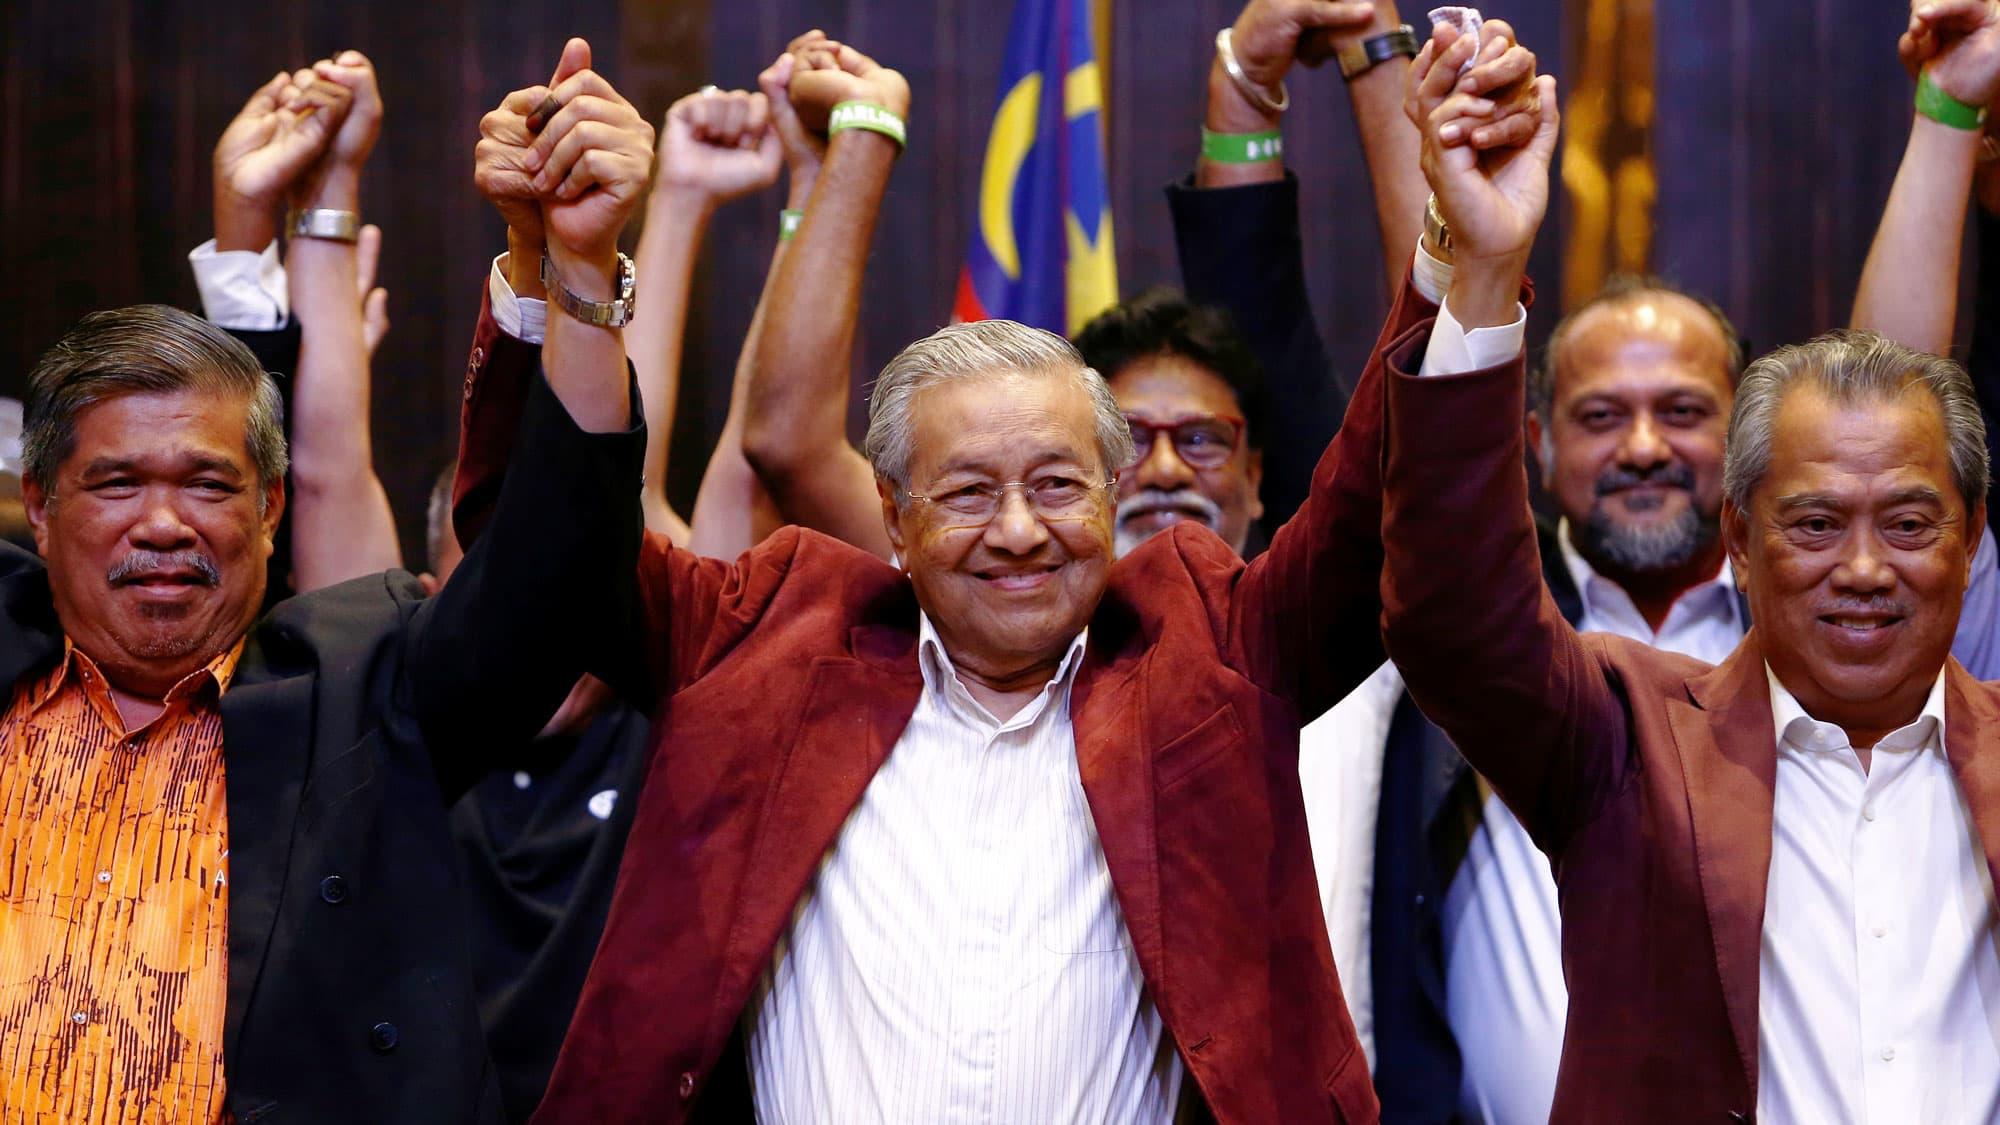 Mahathir's Pakatan Harapan government 1 year after shock election win